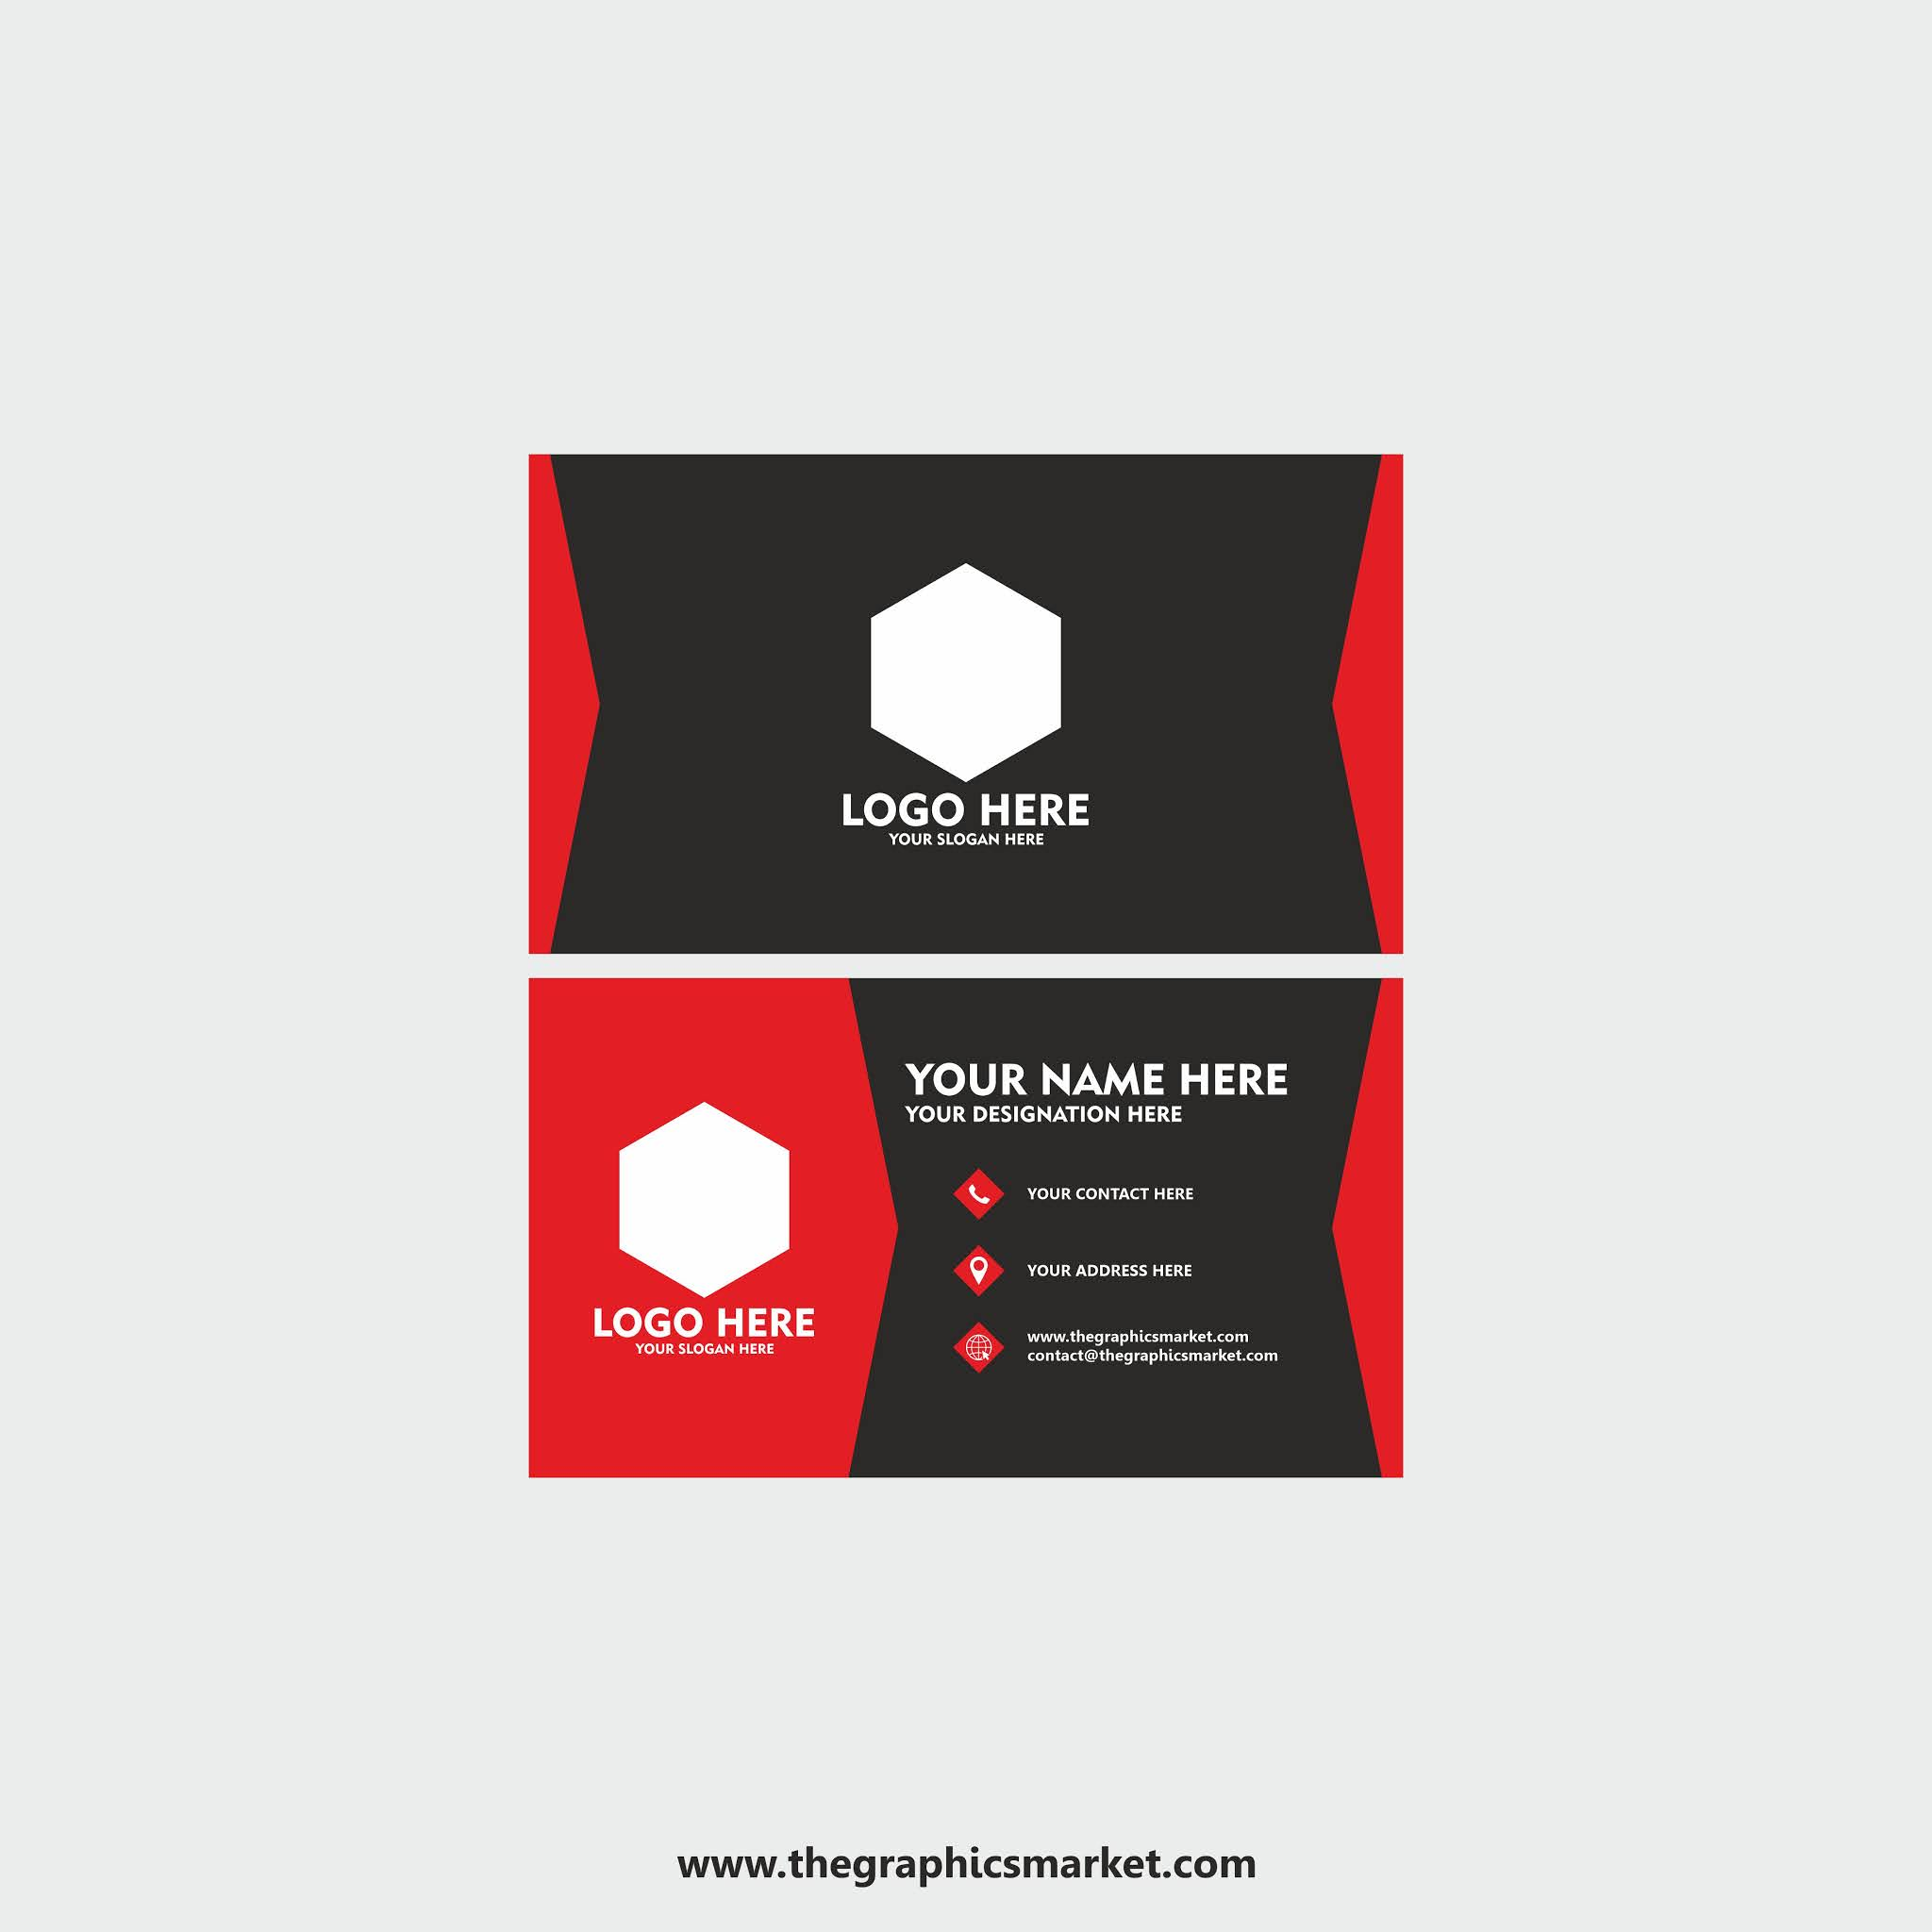 the graphics market, thegraphicsmarket, business card design,